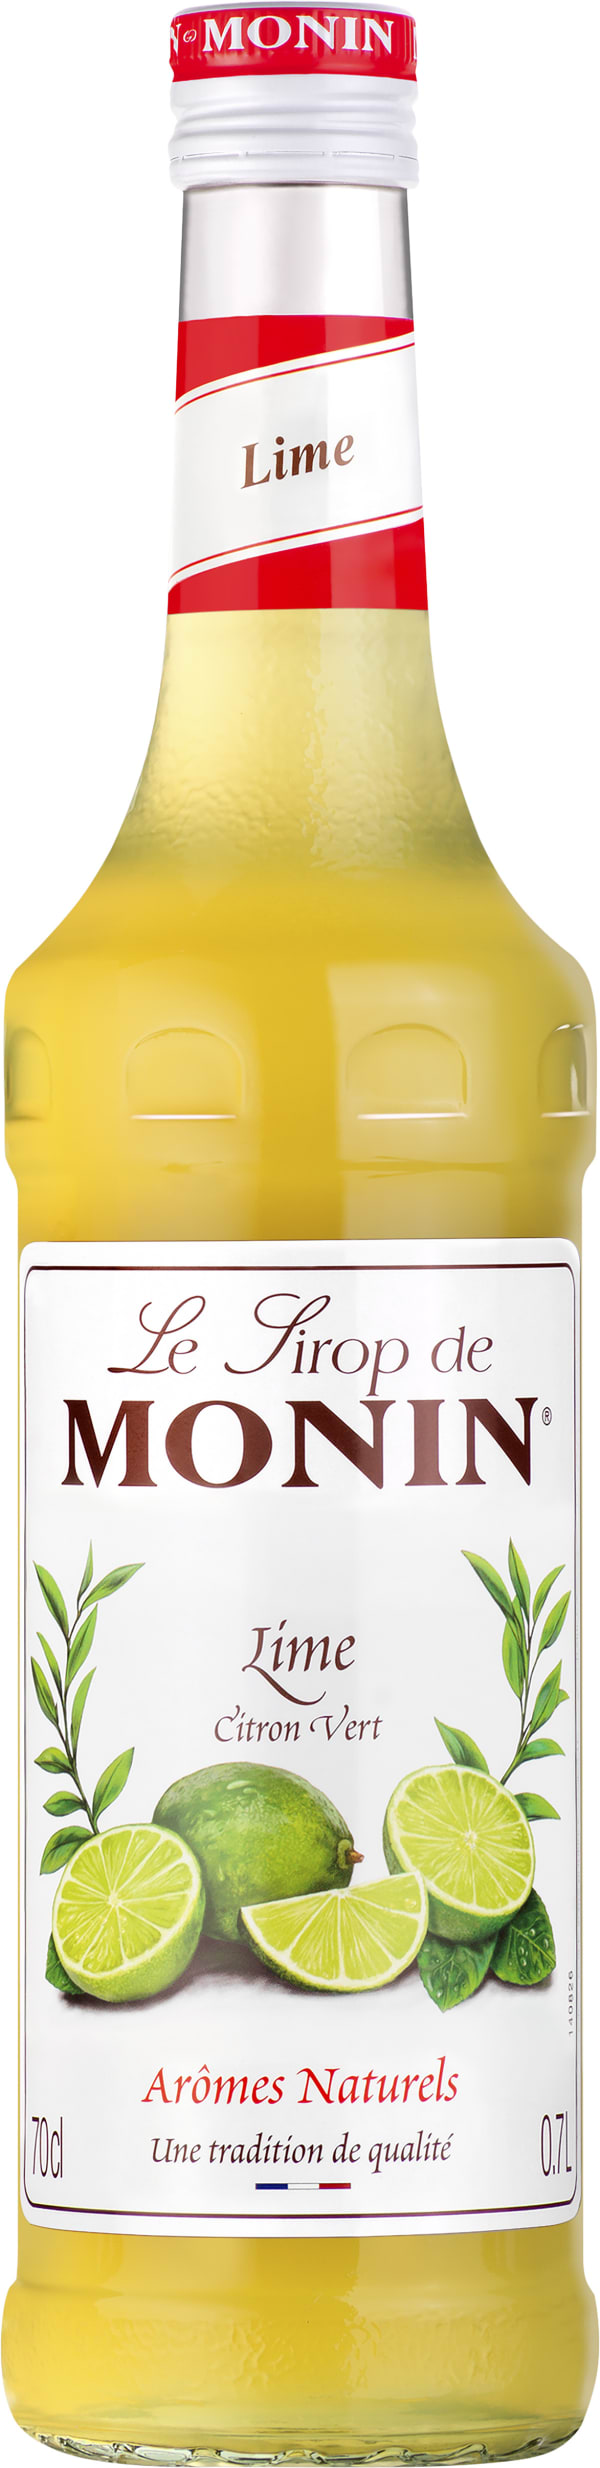 Le Sirop de Monin Lime Citron Vert